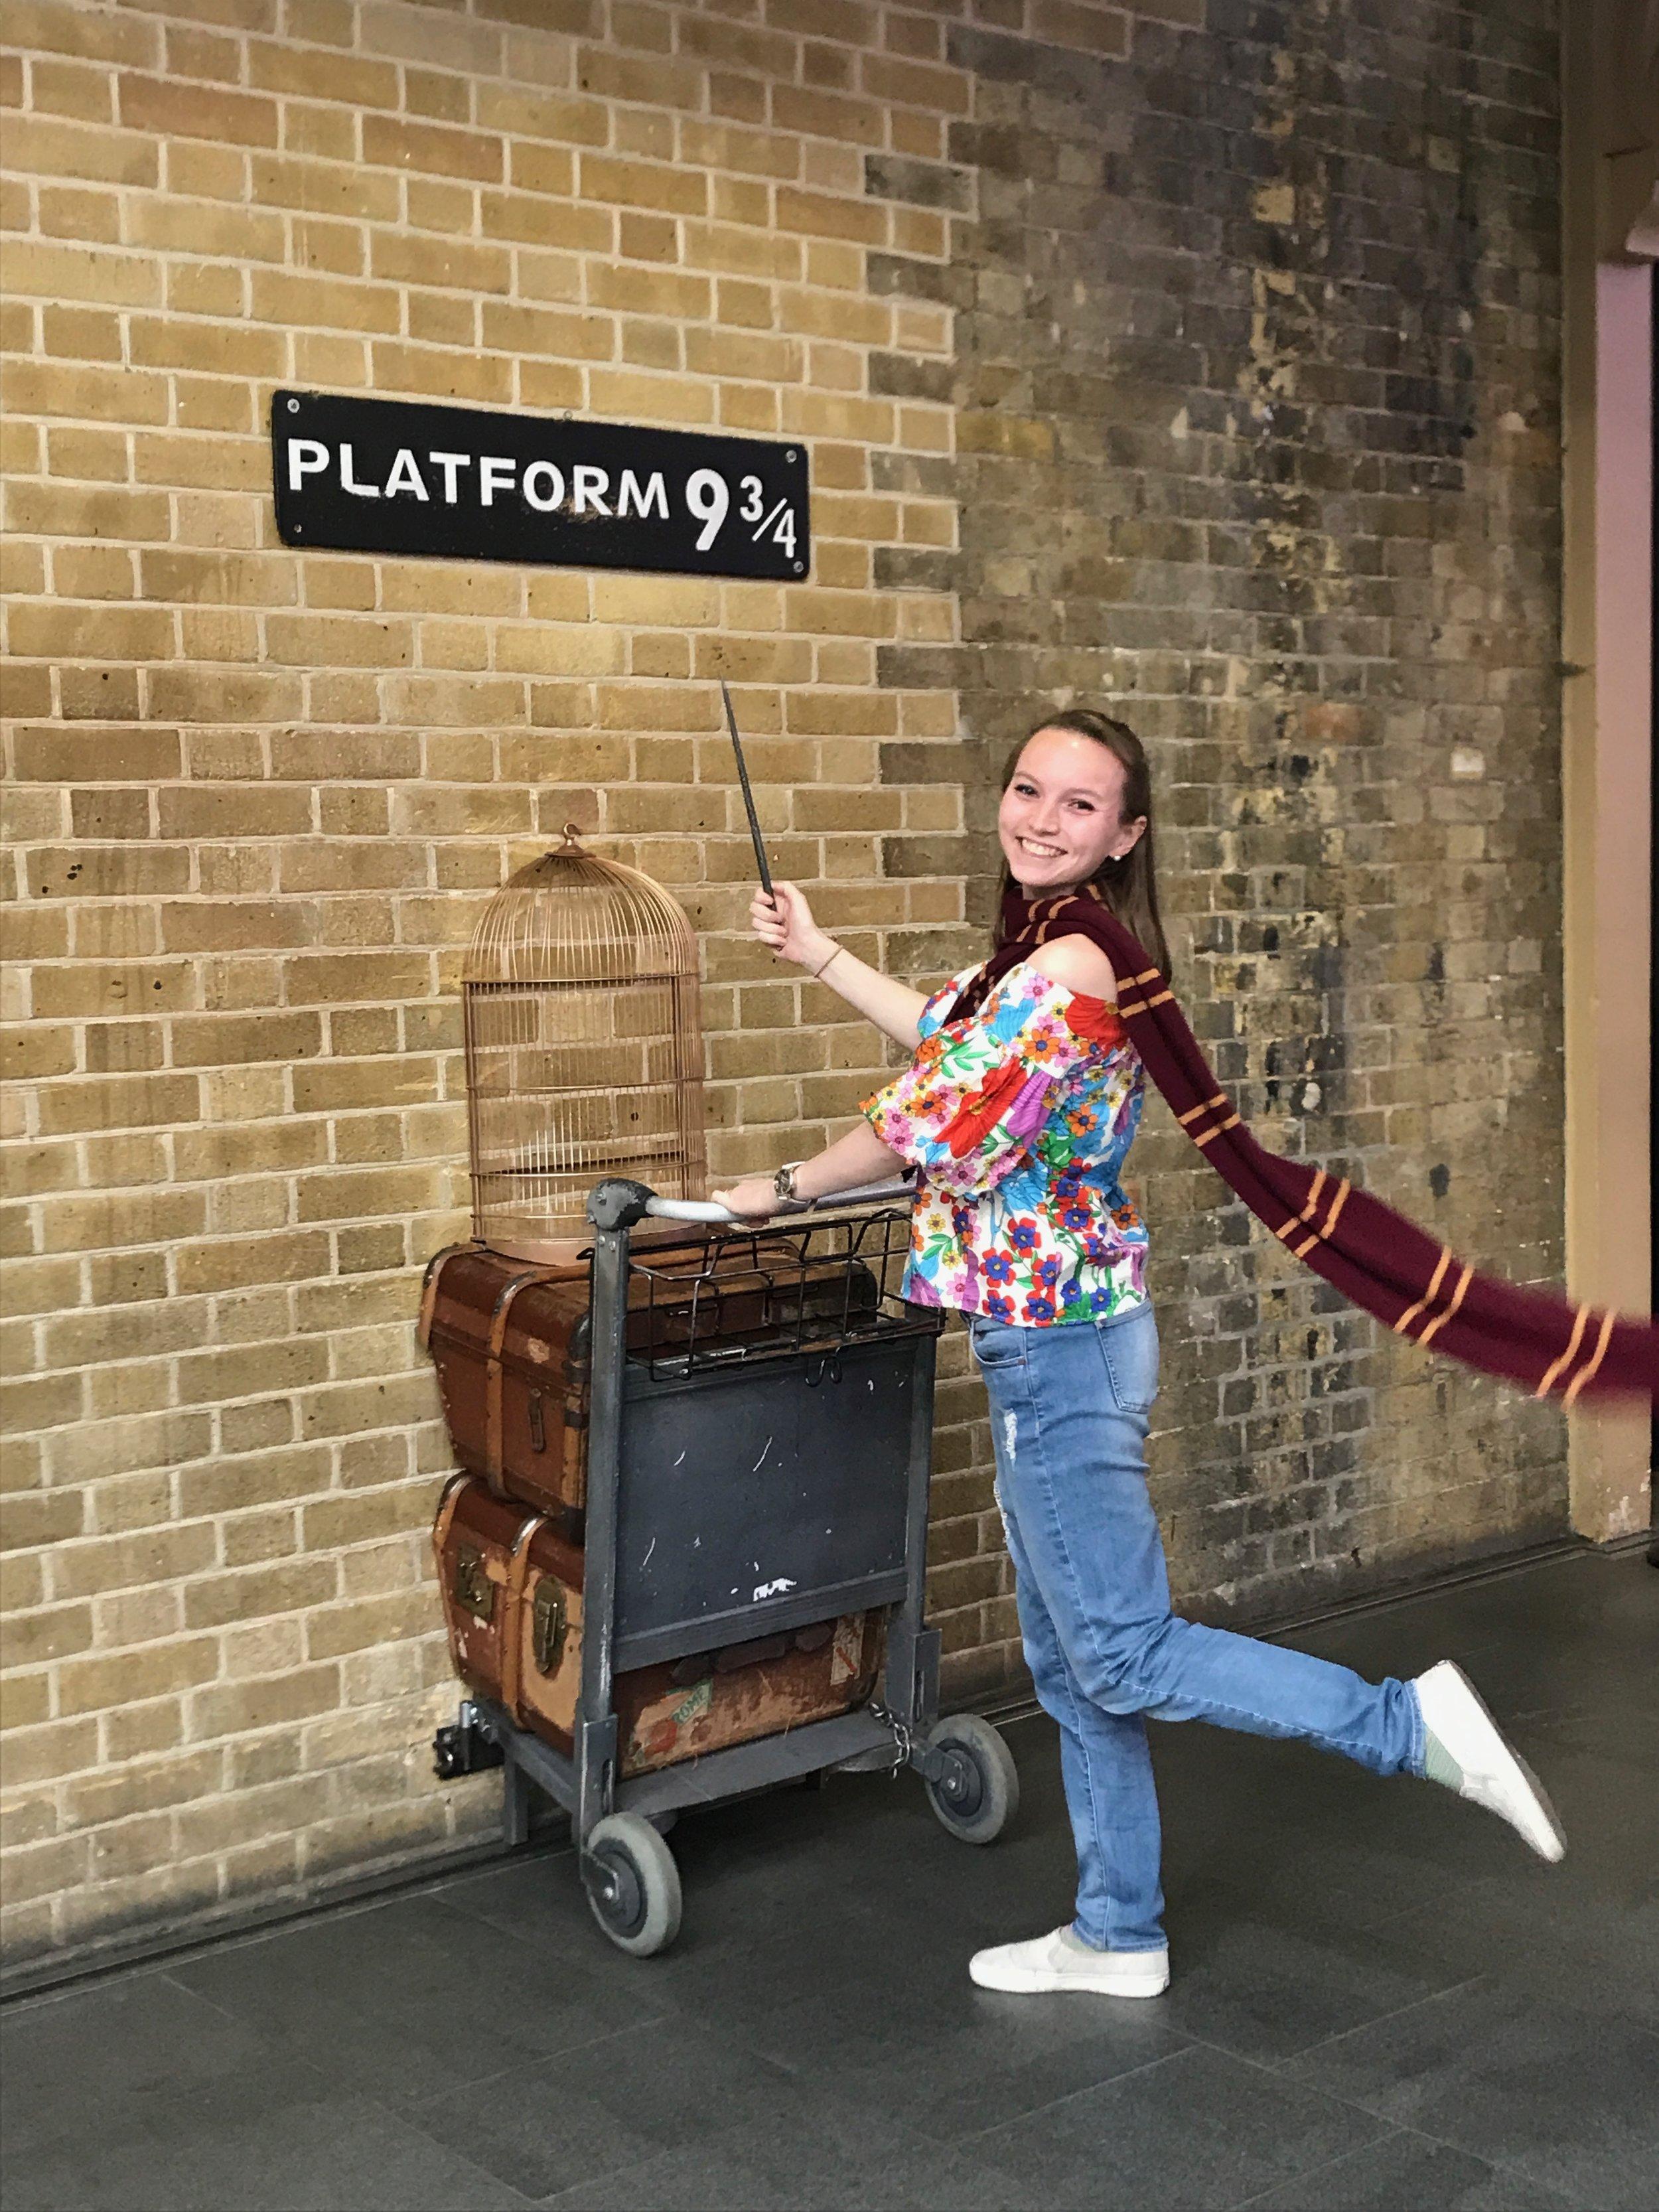 Kristina MacLennan - Platform 9 3-4 in London, England.jpg